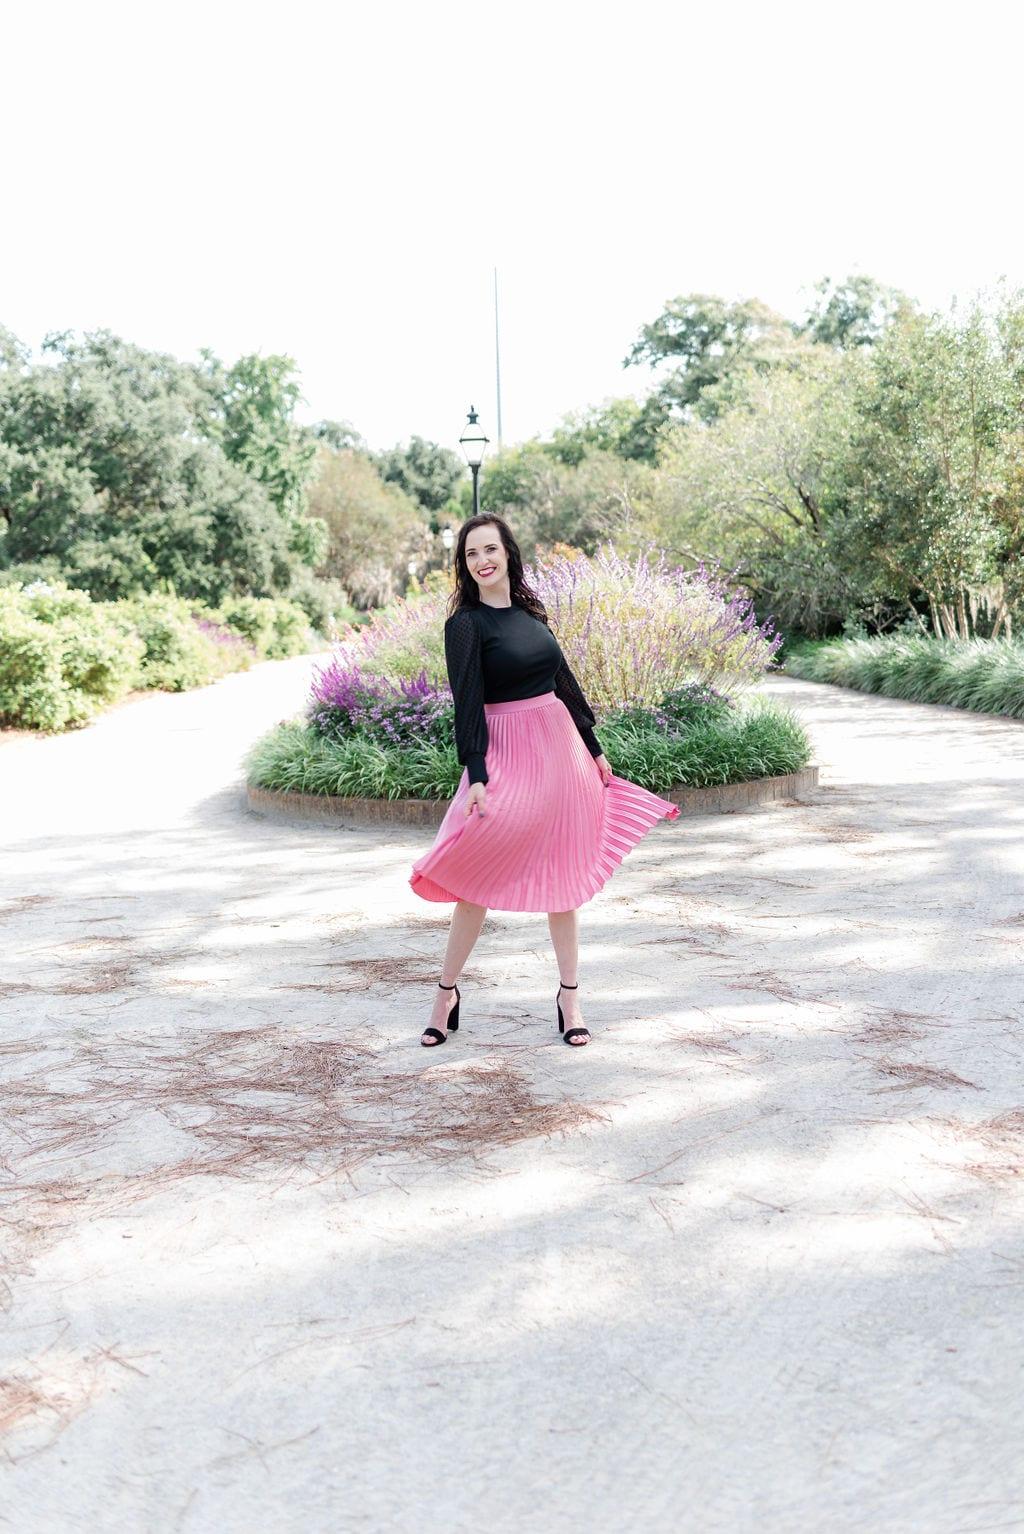 dress-skirt-style-trend